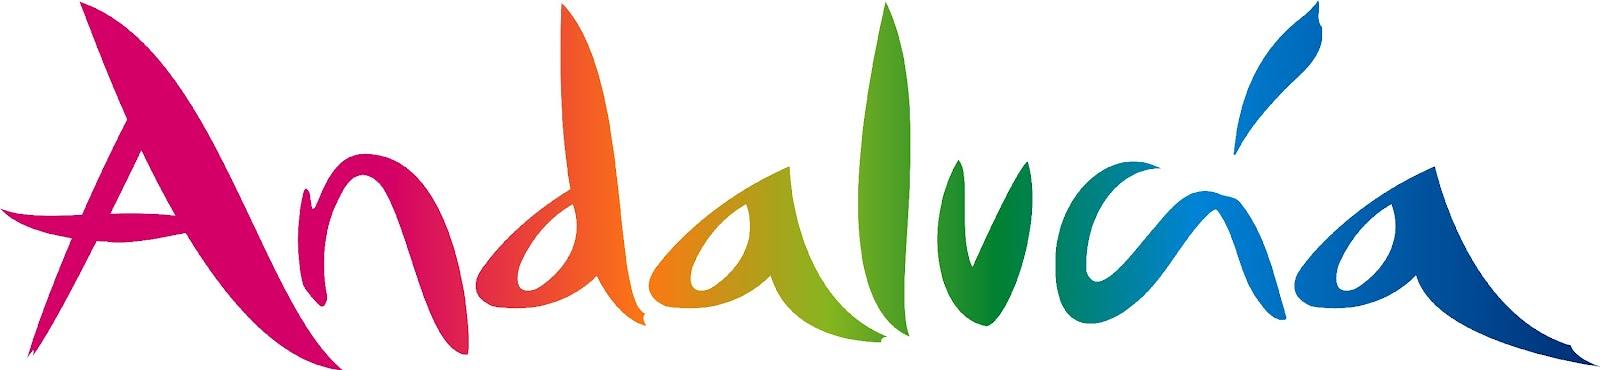 horario biblioteca malaga: